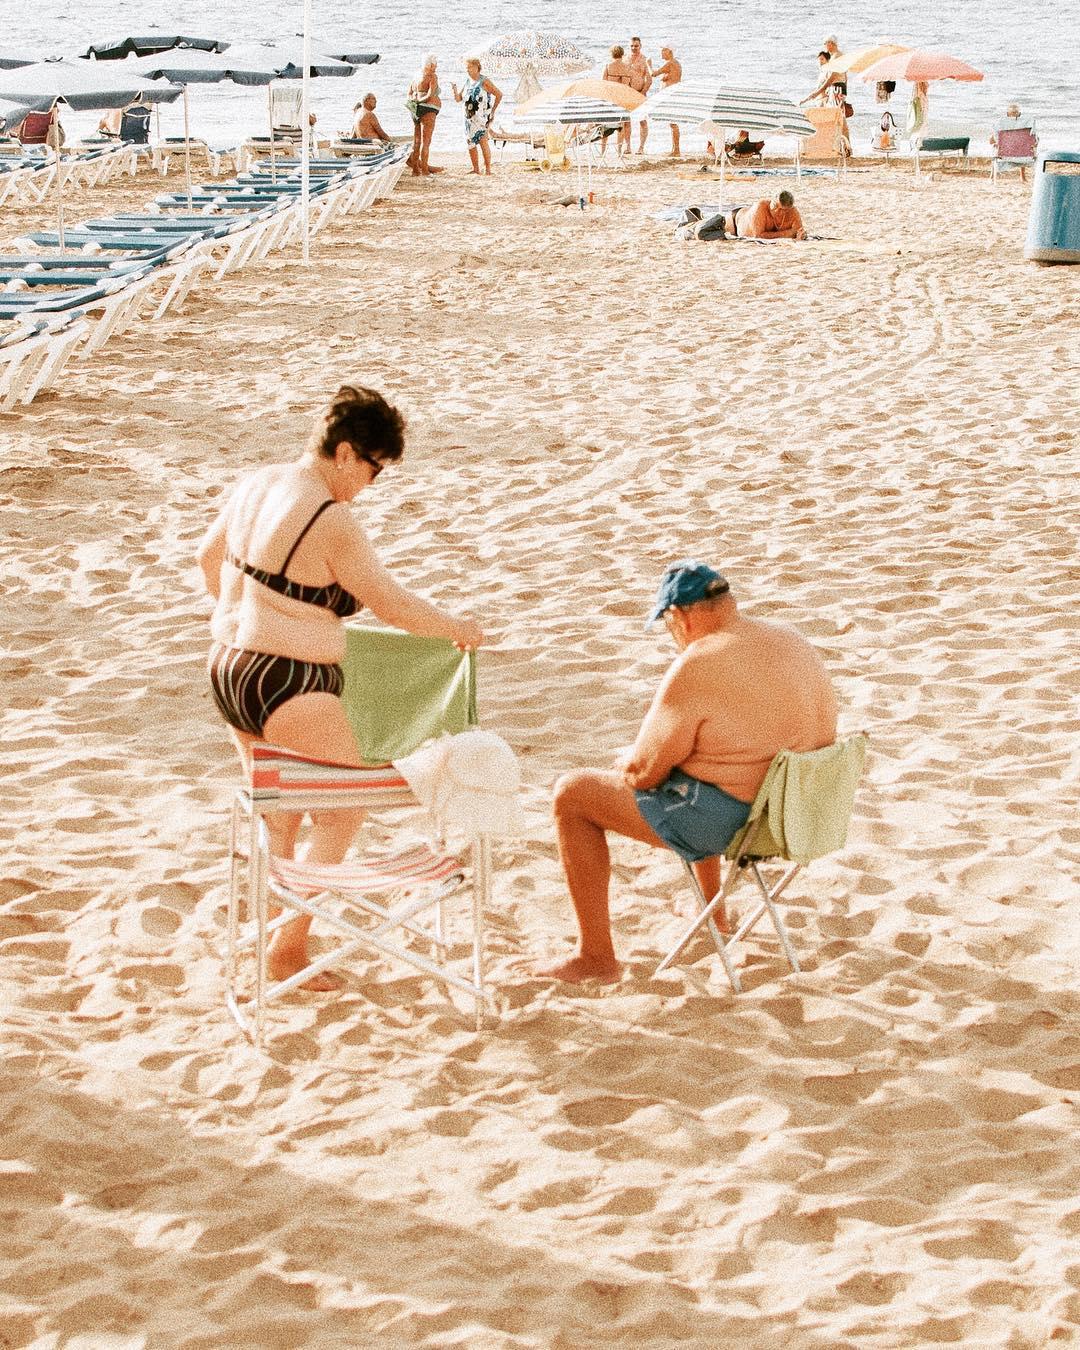 fotografo Joaquin Lucas paleta de colores de Wes Anderson  (51)